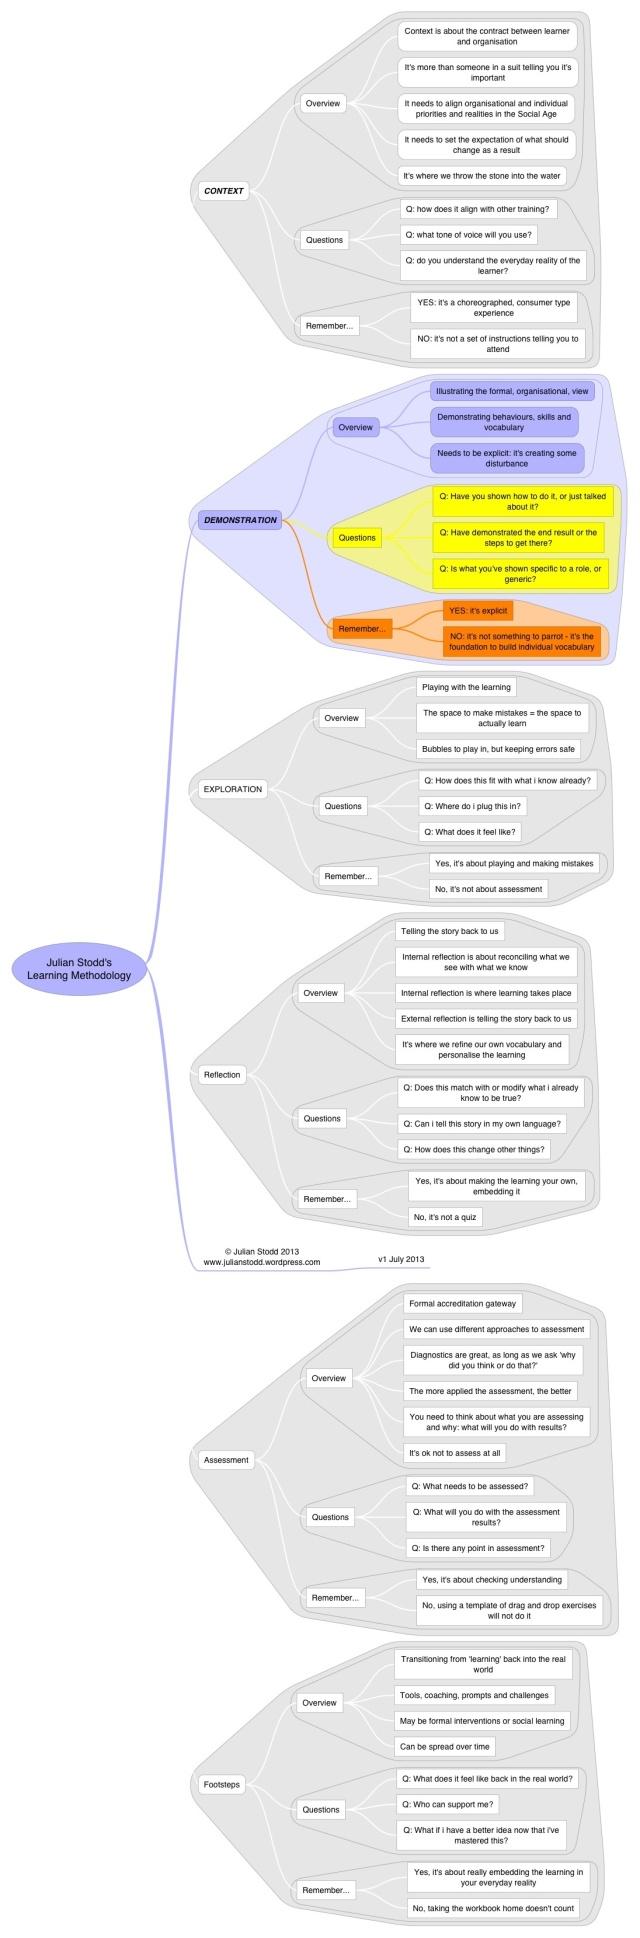 Methodology - demonstration